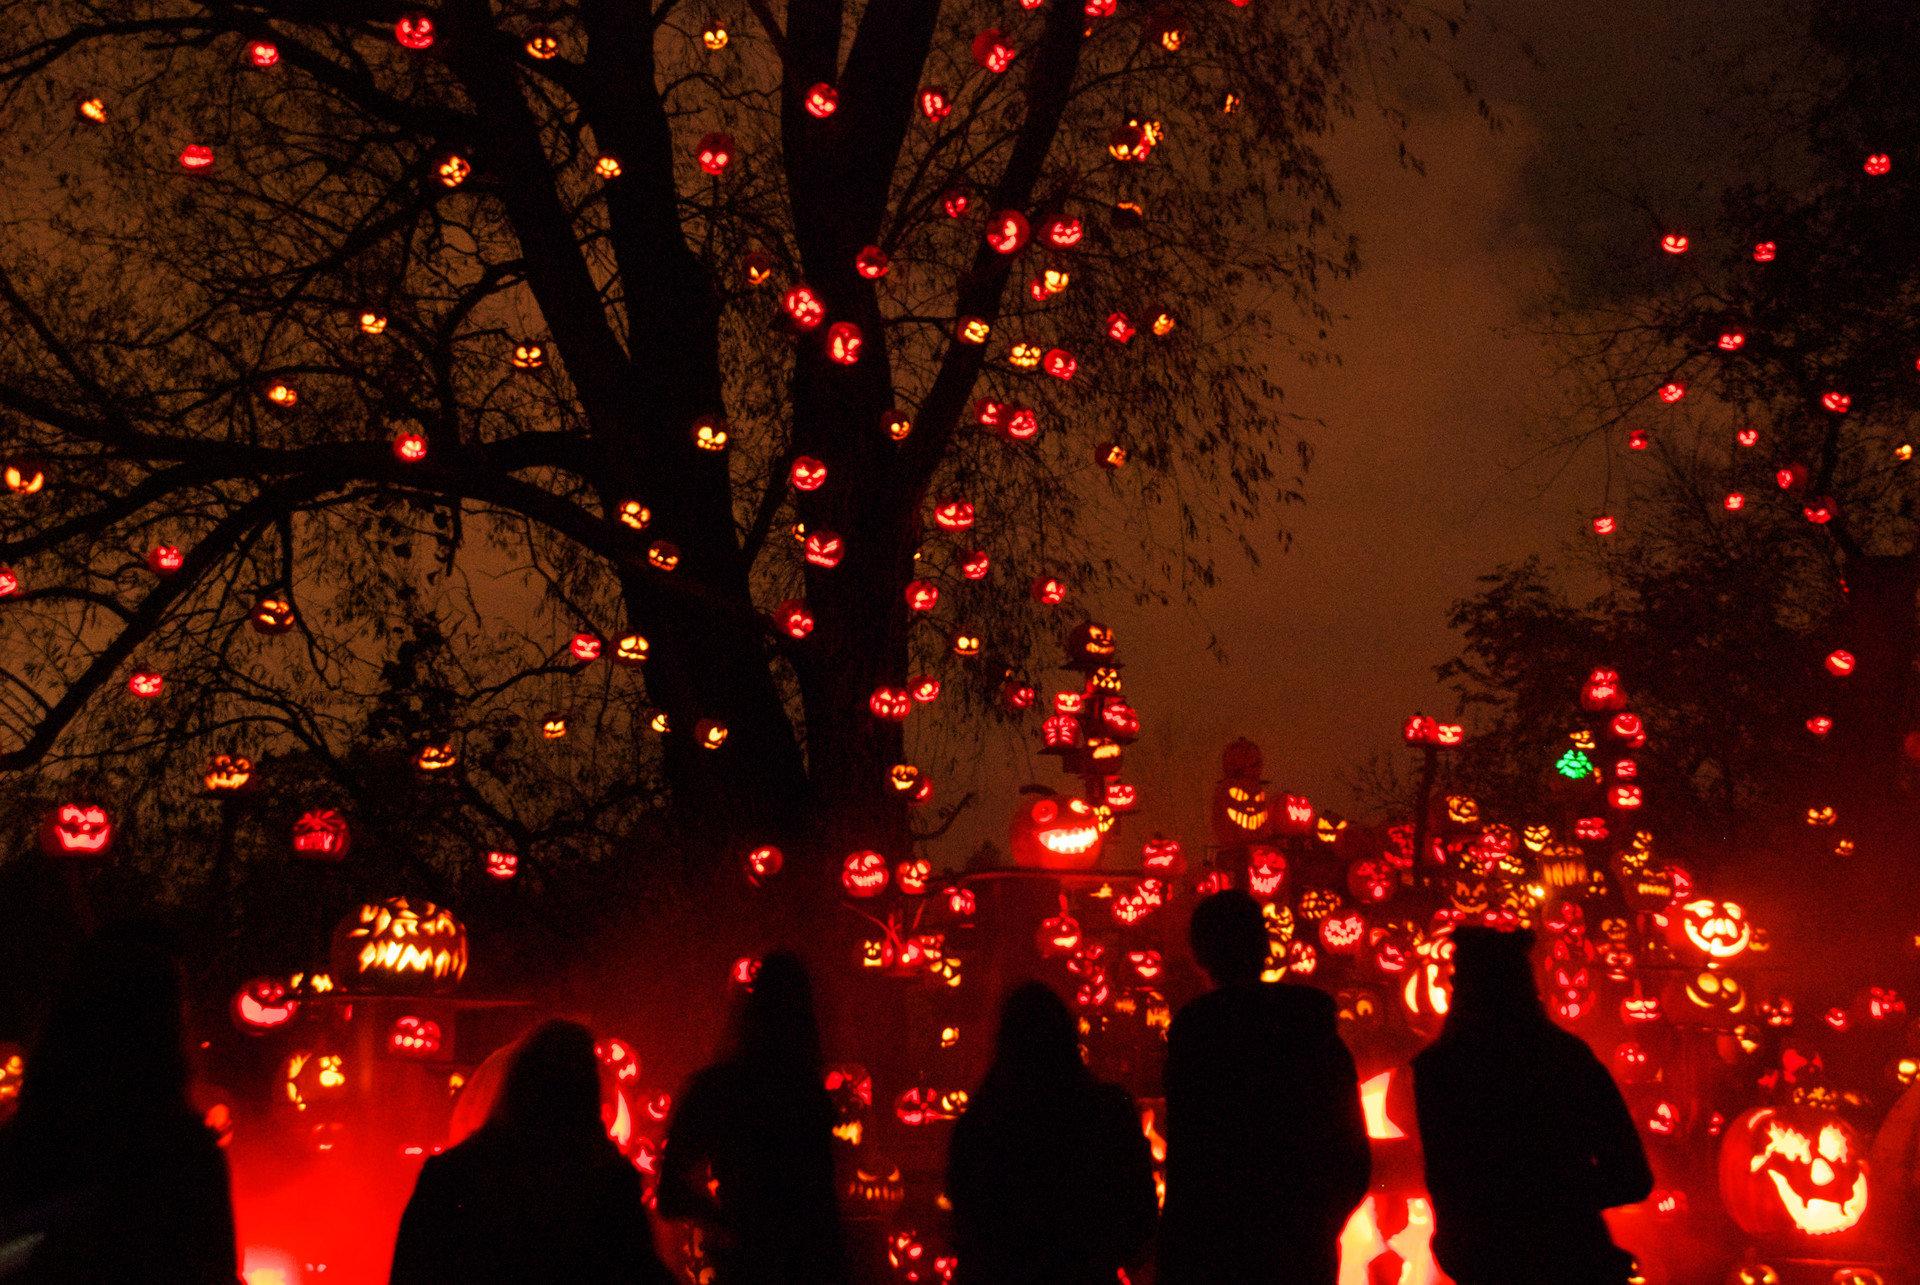 duplicate festive glow halloween holiday lights night night lights orange Outdoors pumpkins silhouette trees Trip Ideas outdoor christmas lights Christmas light christmas decoration darkness event bunch